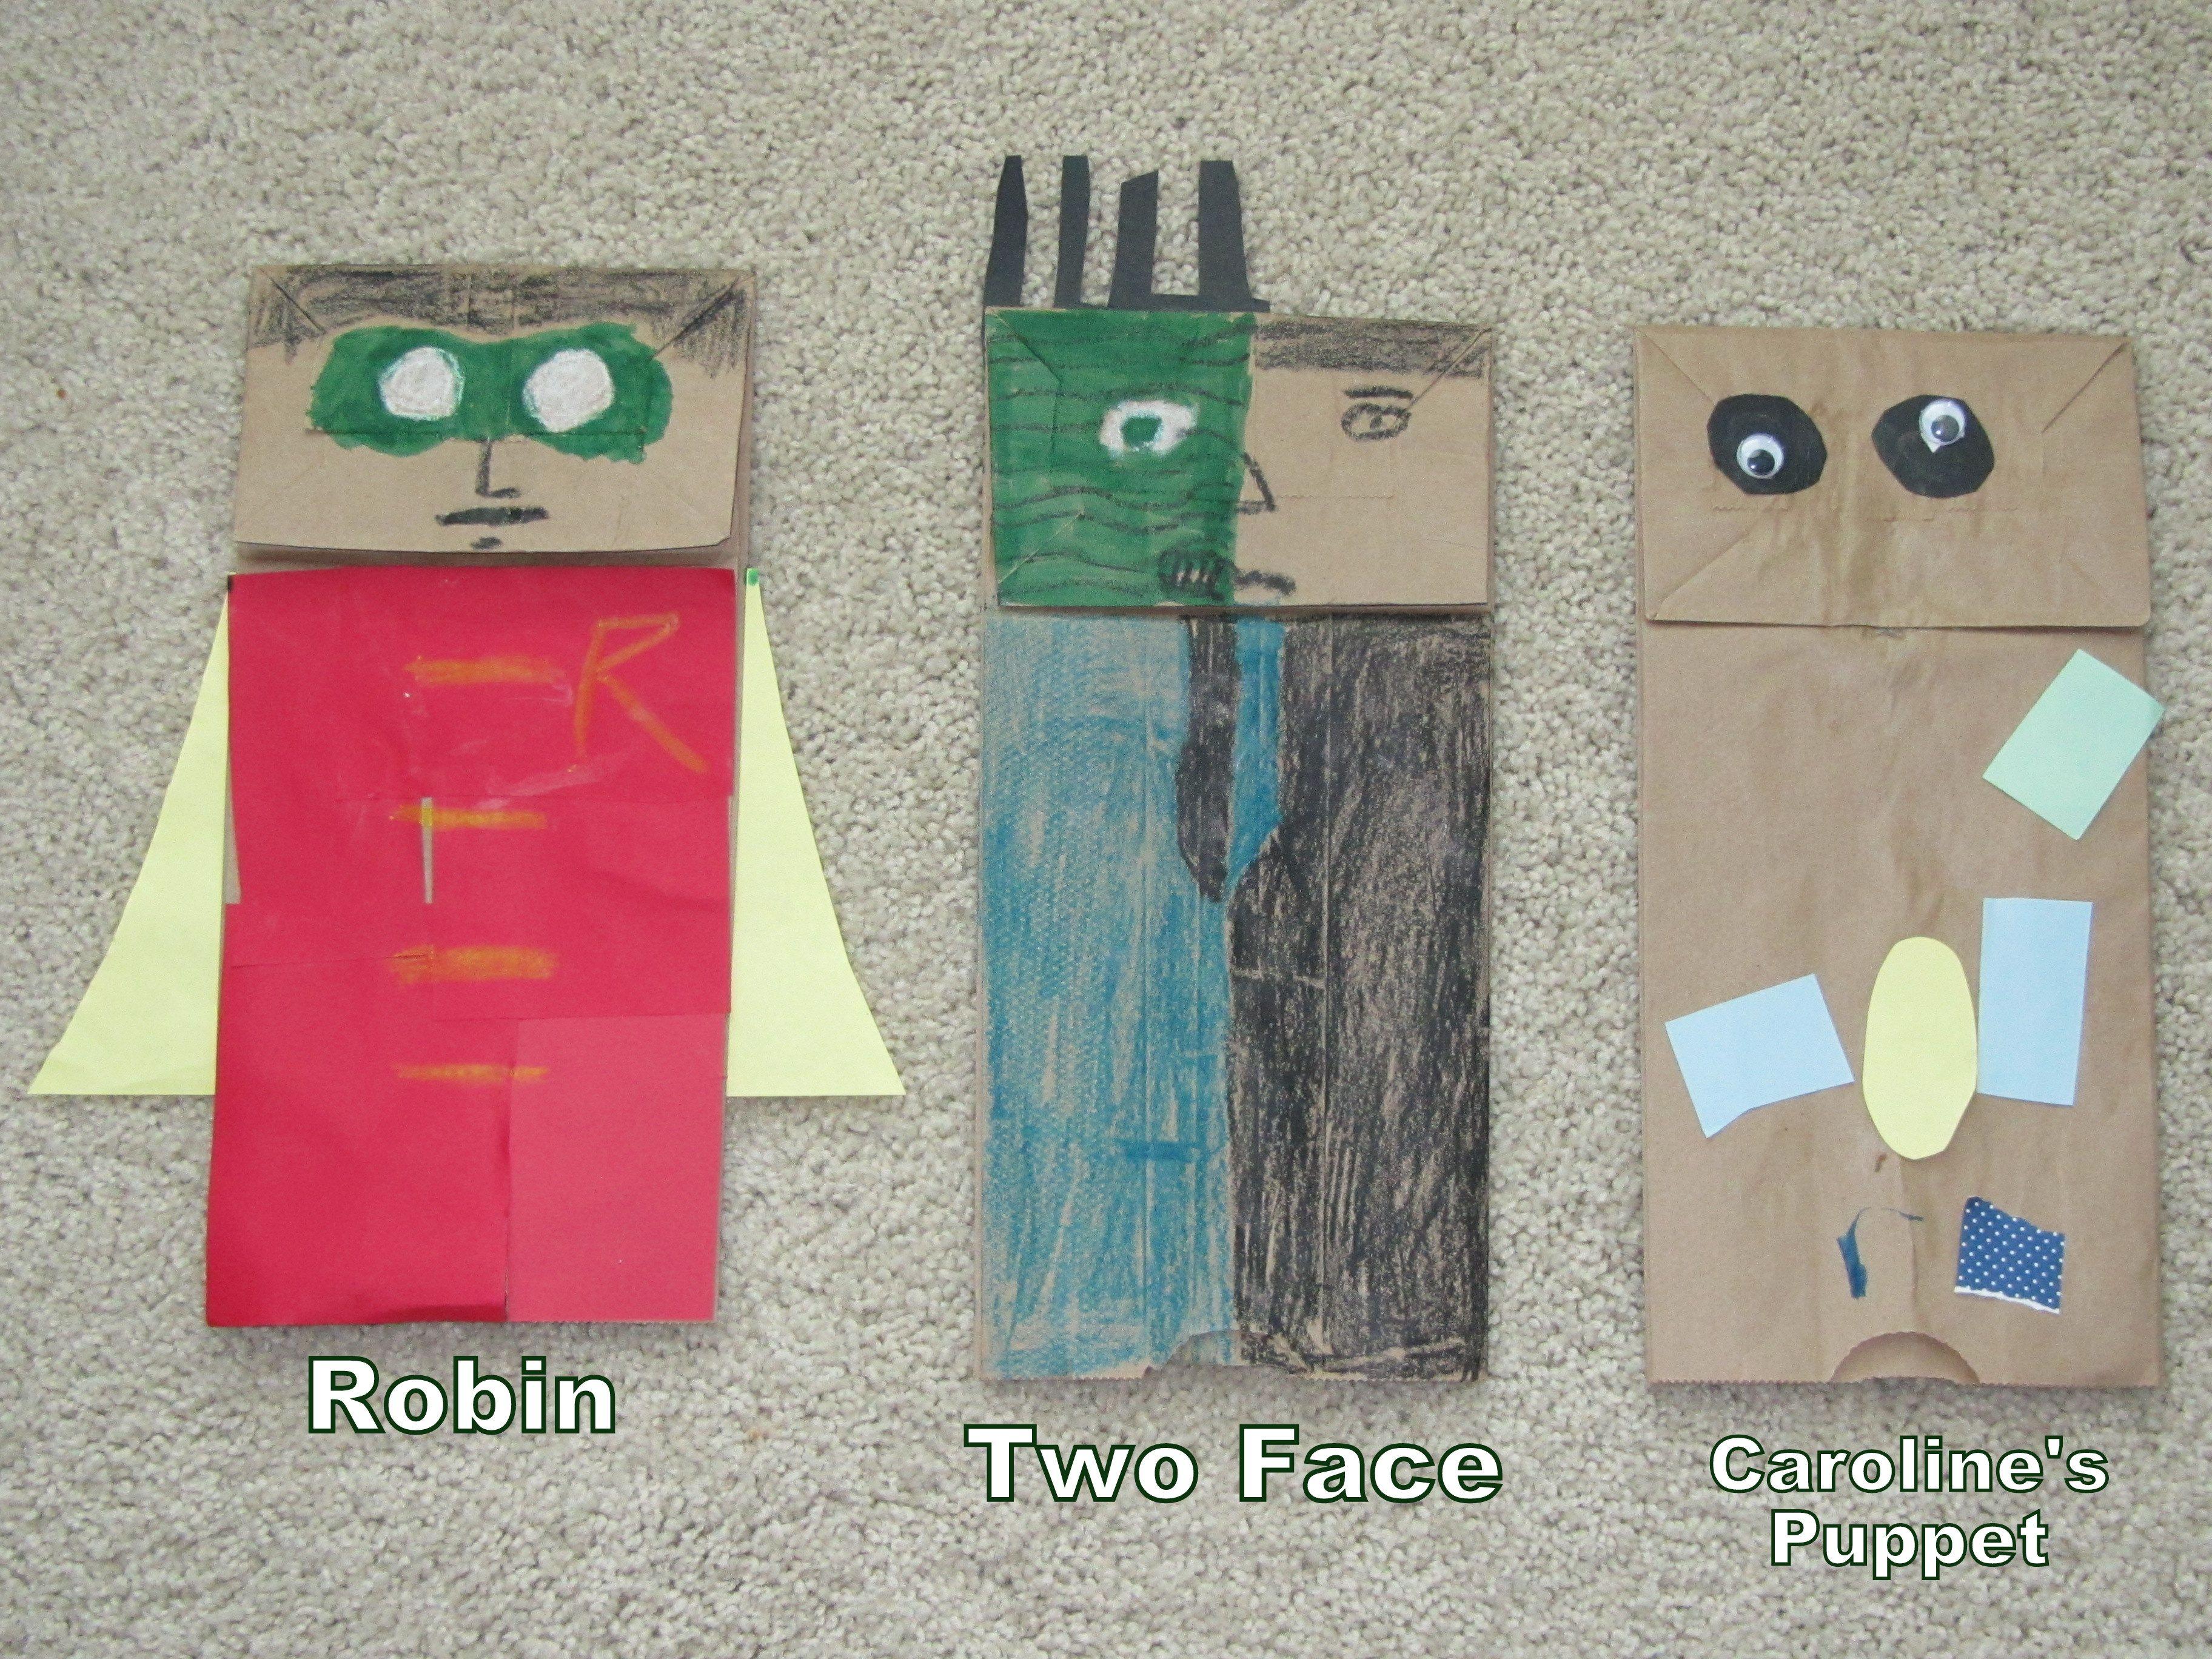 Paper bag activity - Paperbag Puppets Activity Idea